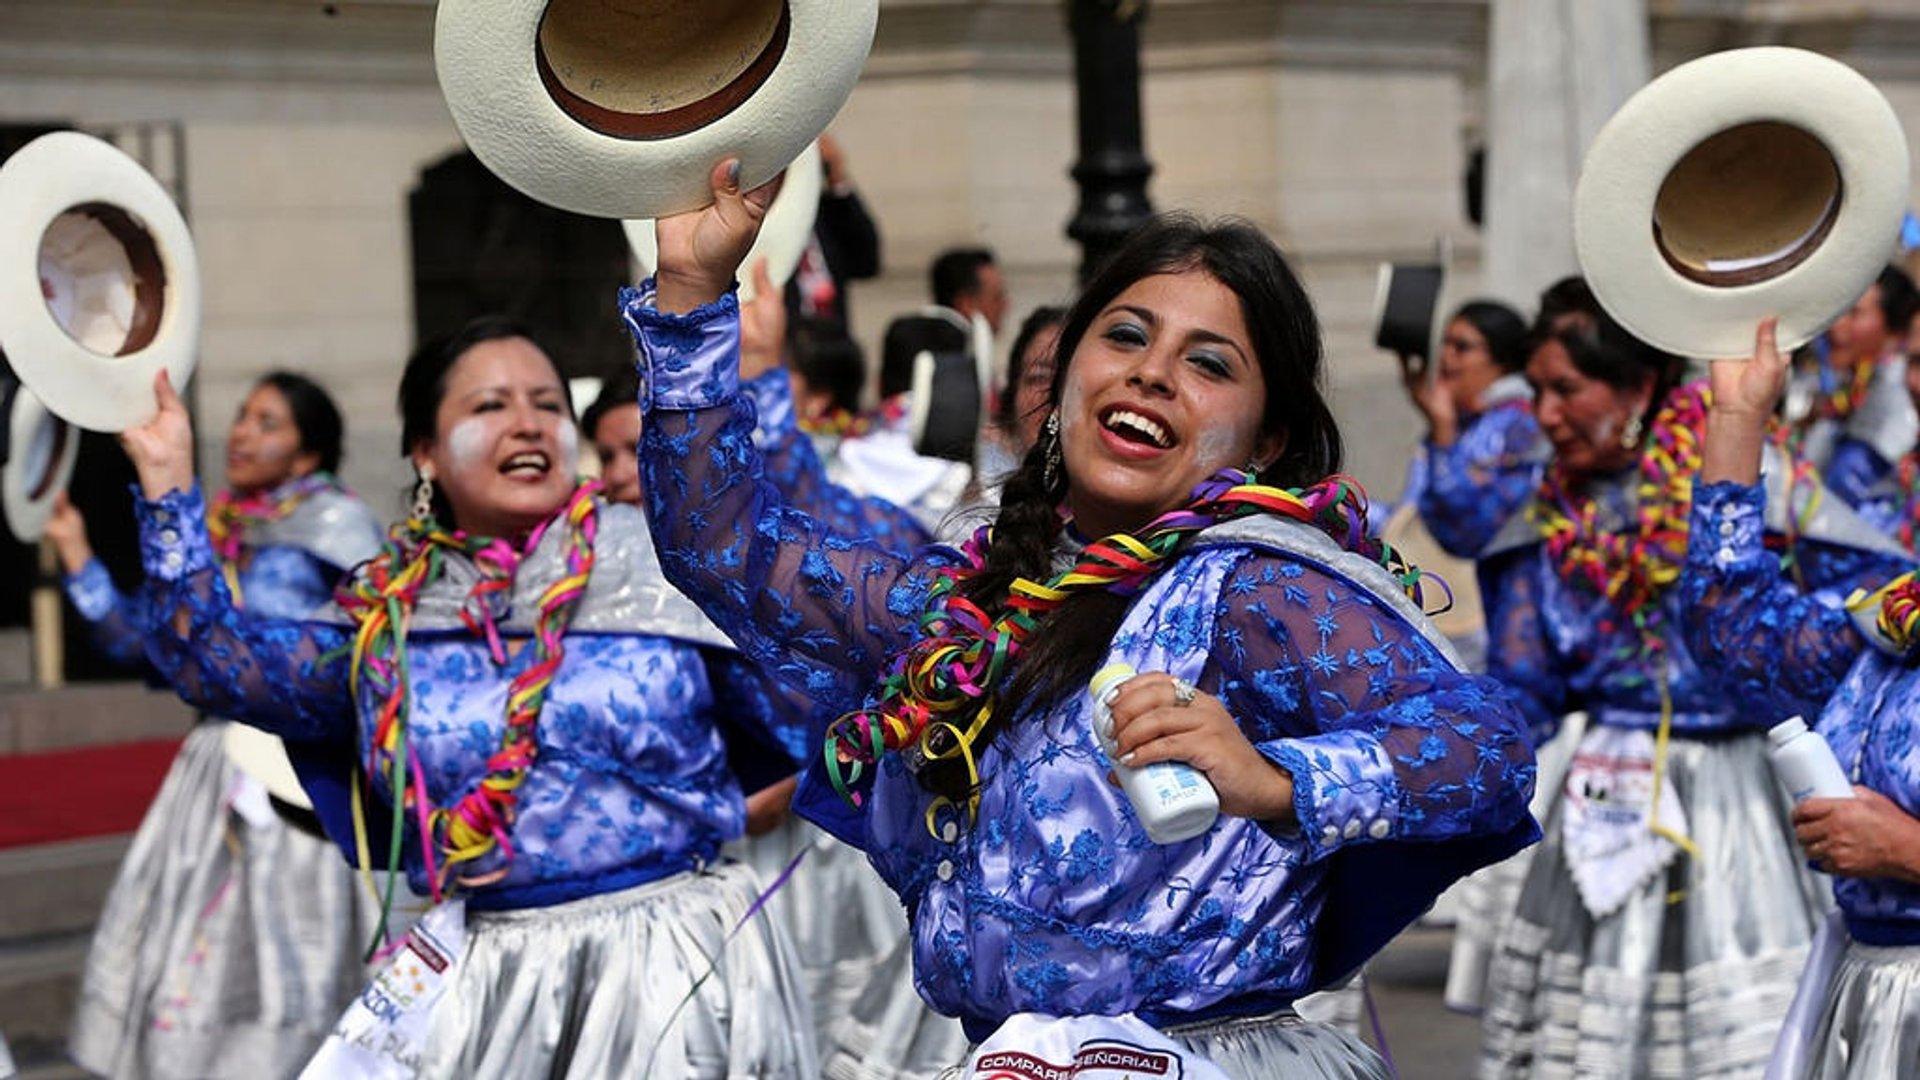 Carnaval de Ayacucho 2020